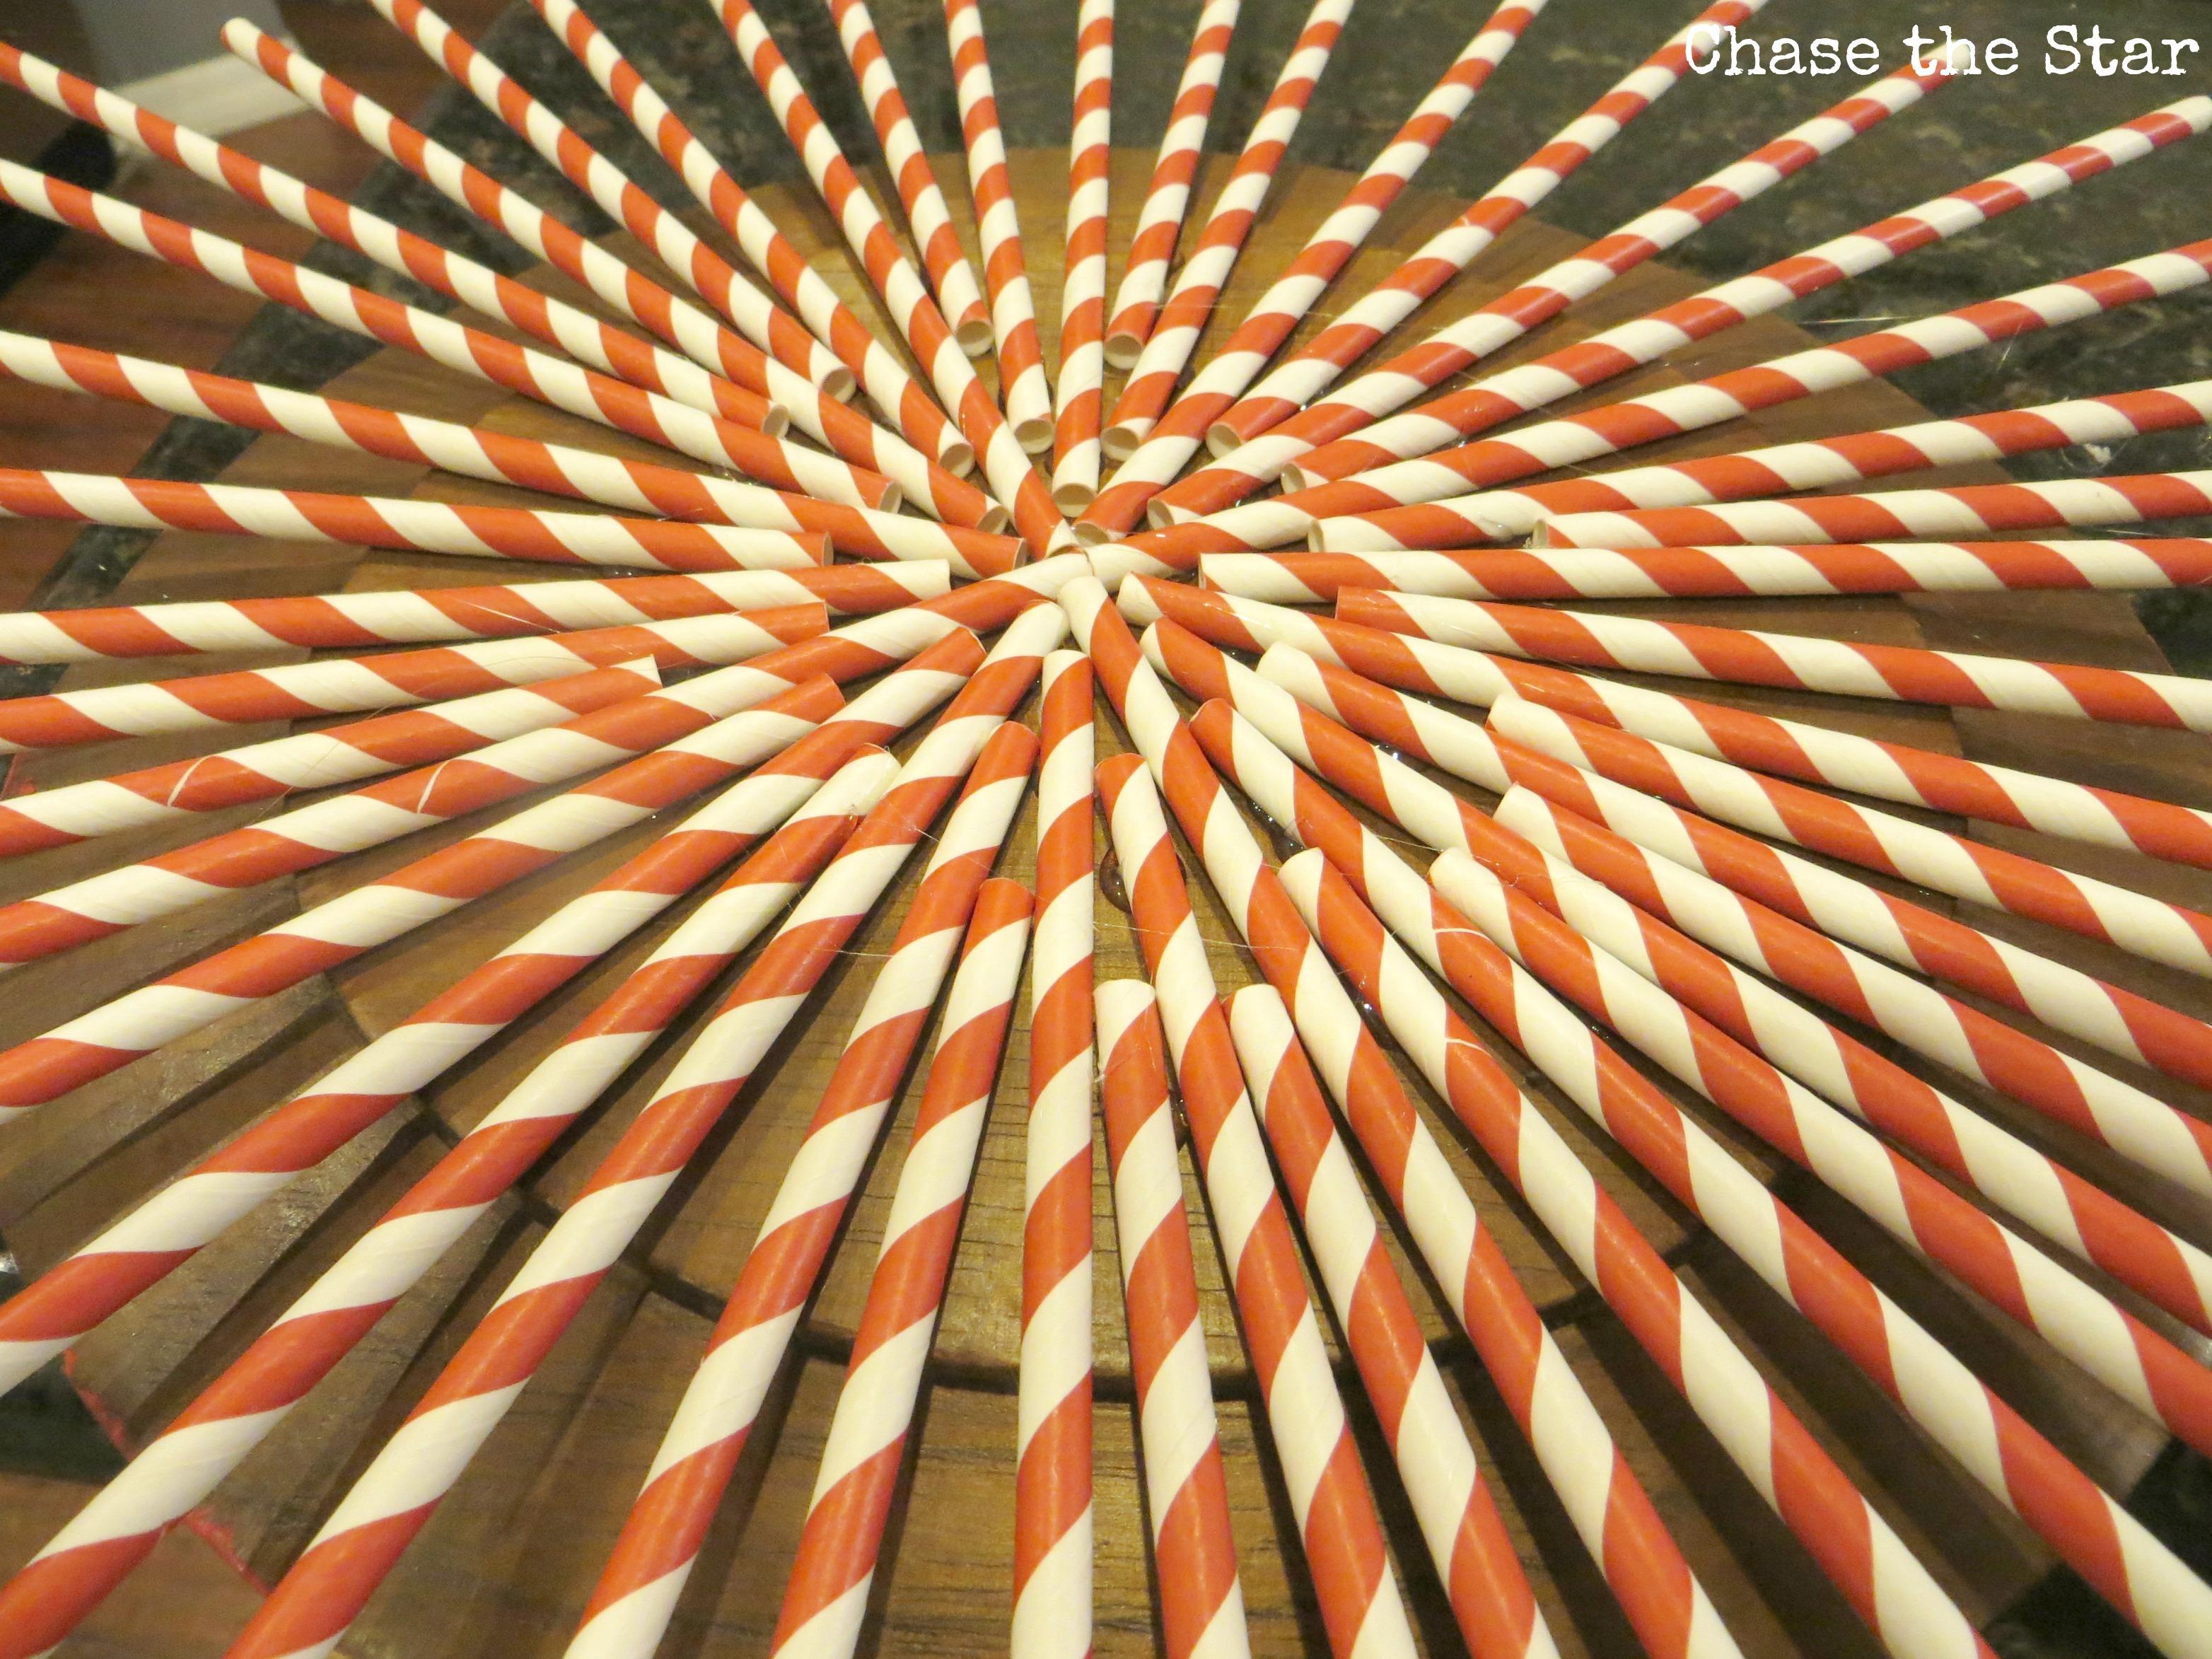 sunburst, valentines day, love, heart, red and white, cardboard straws